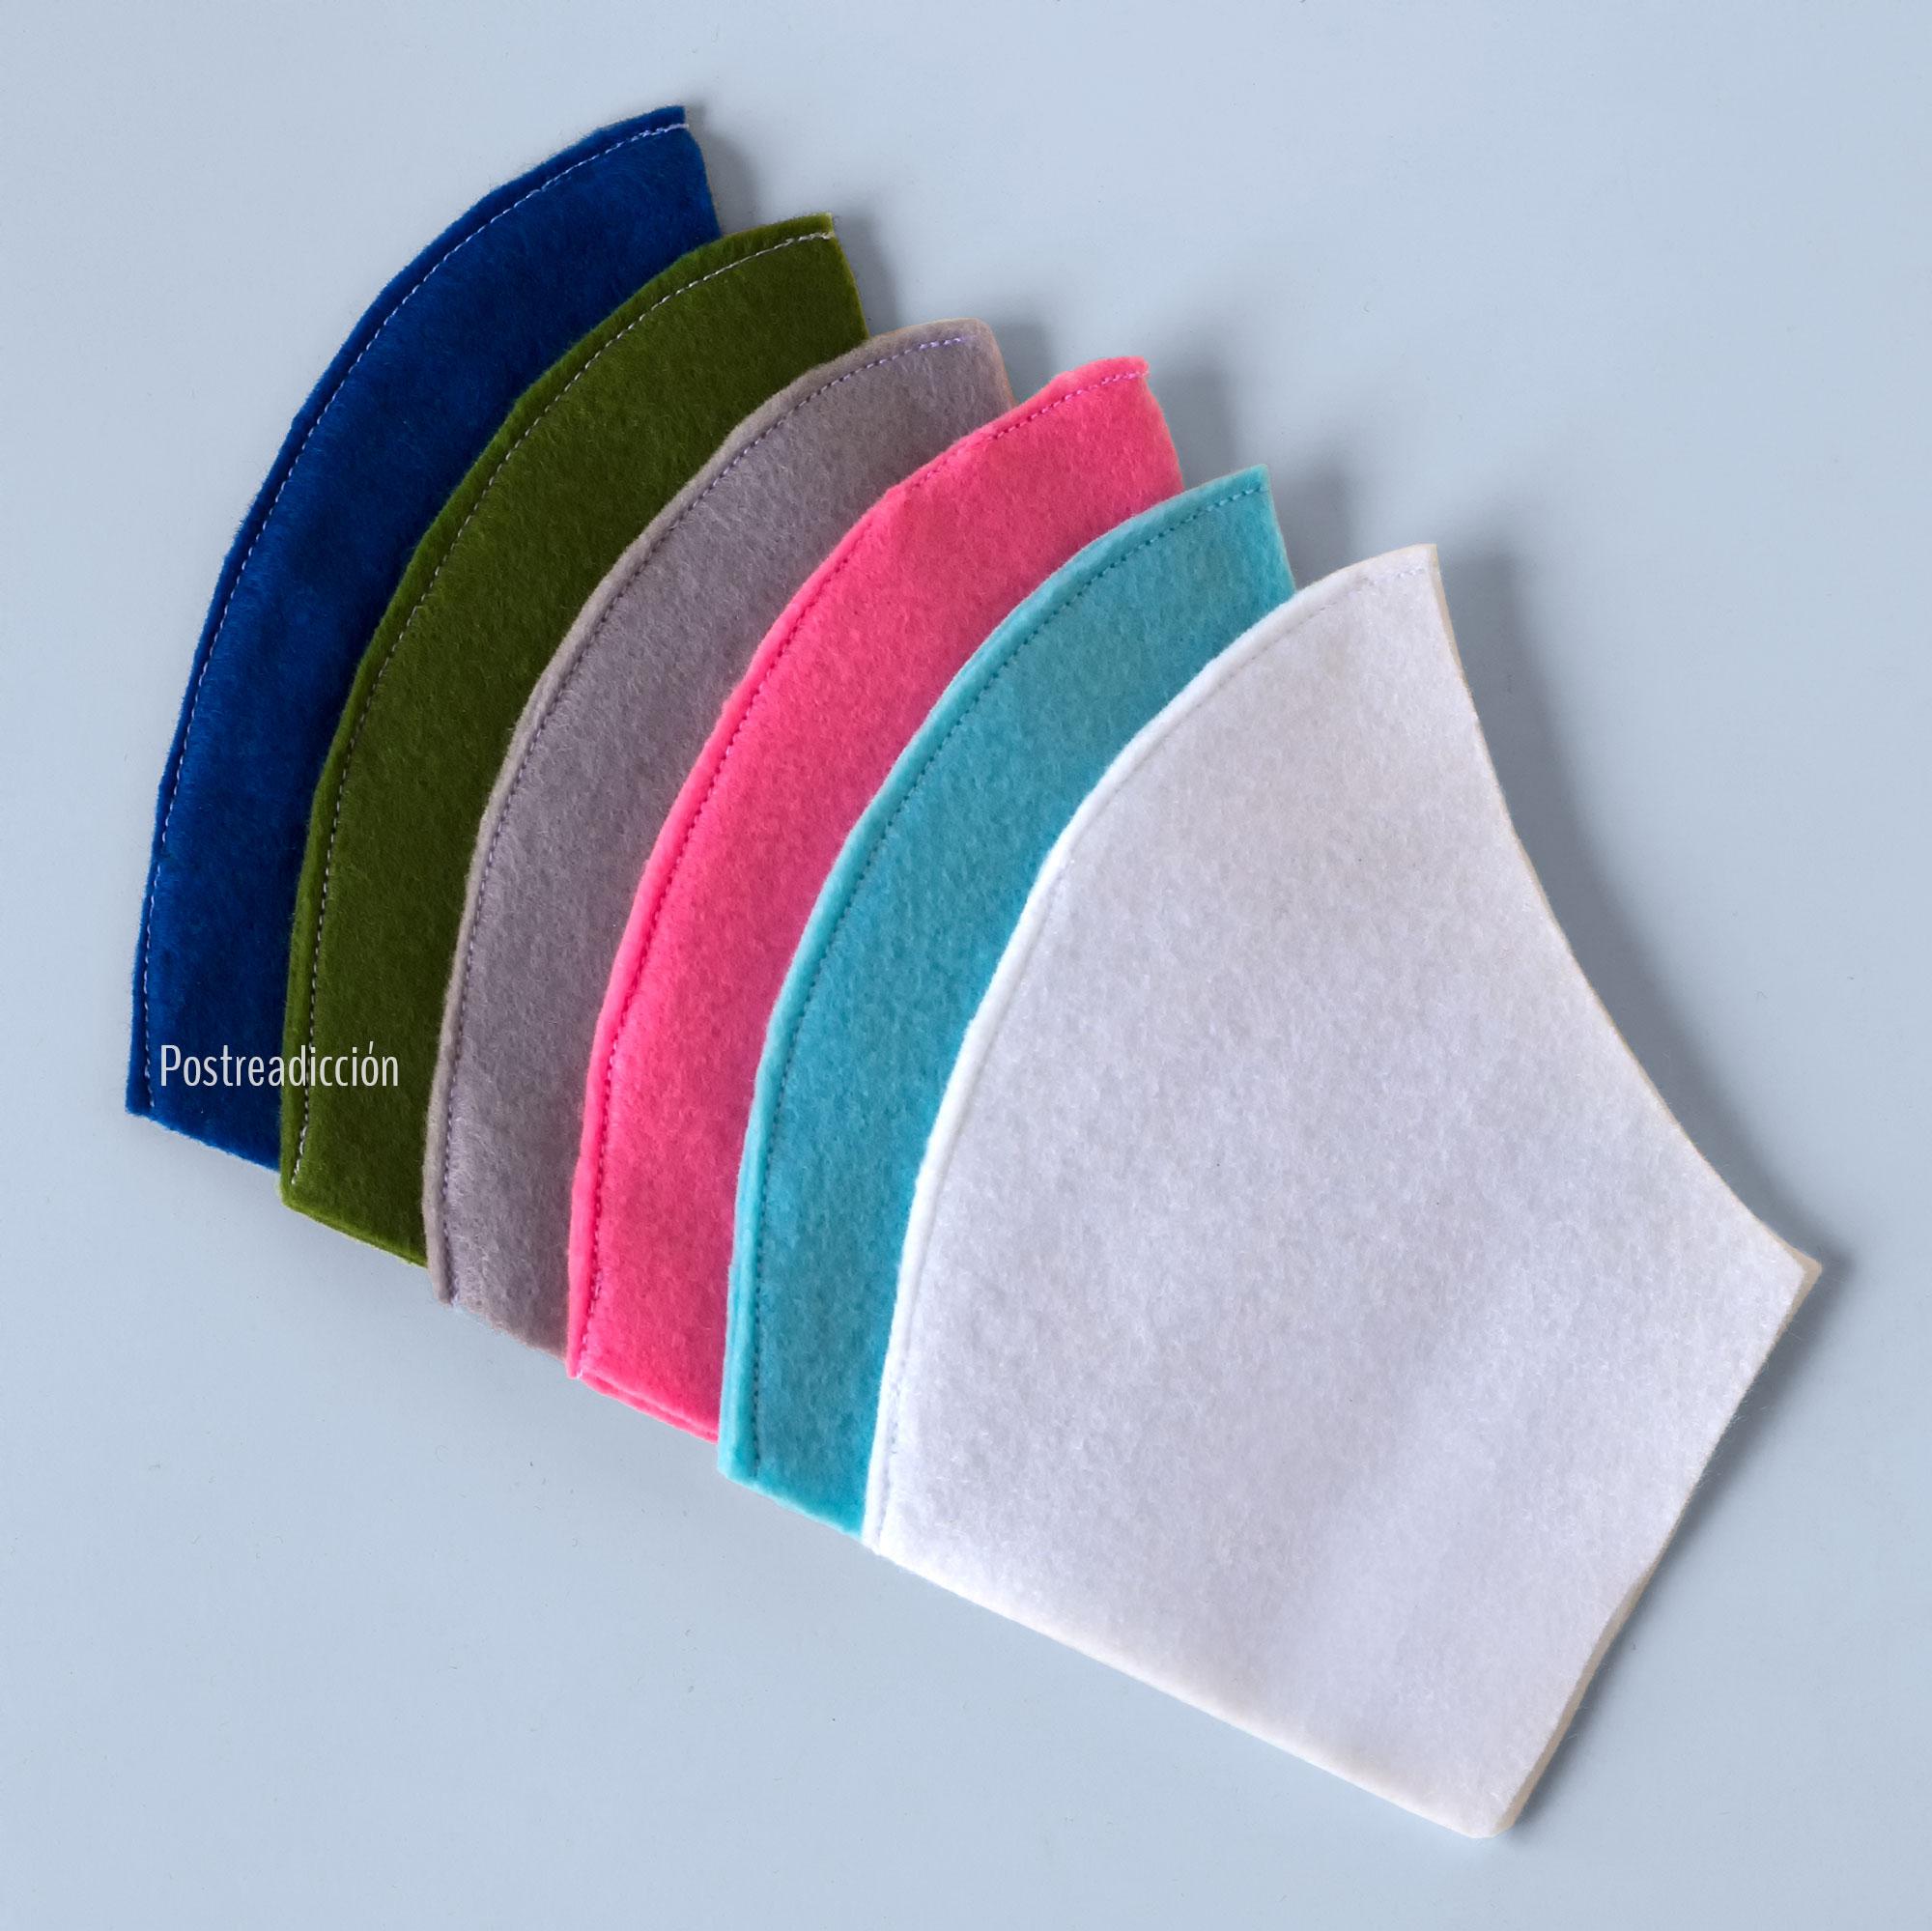 Imagen de producto: https://tienda.postreadiccion.com/img/articulos/secundarias13286-mascarilla-lisa-azul-marino-2.jpg